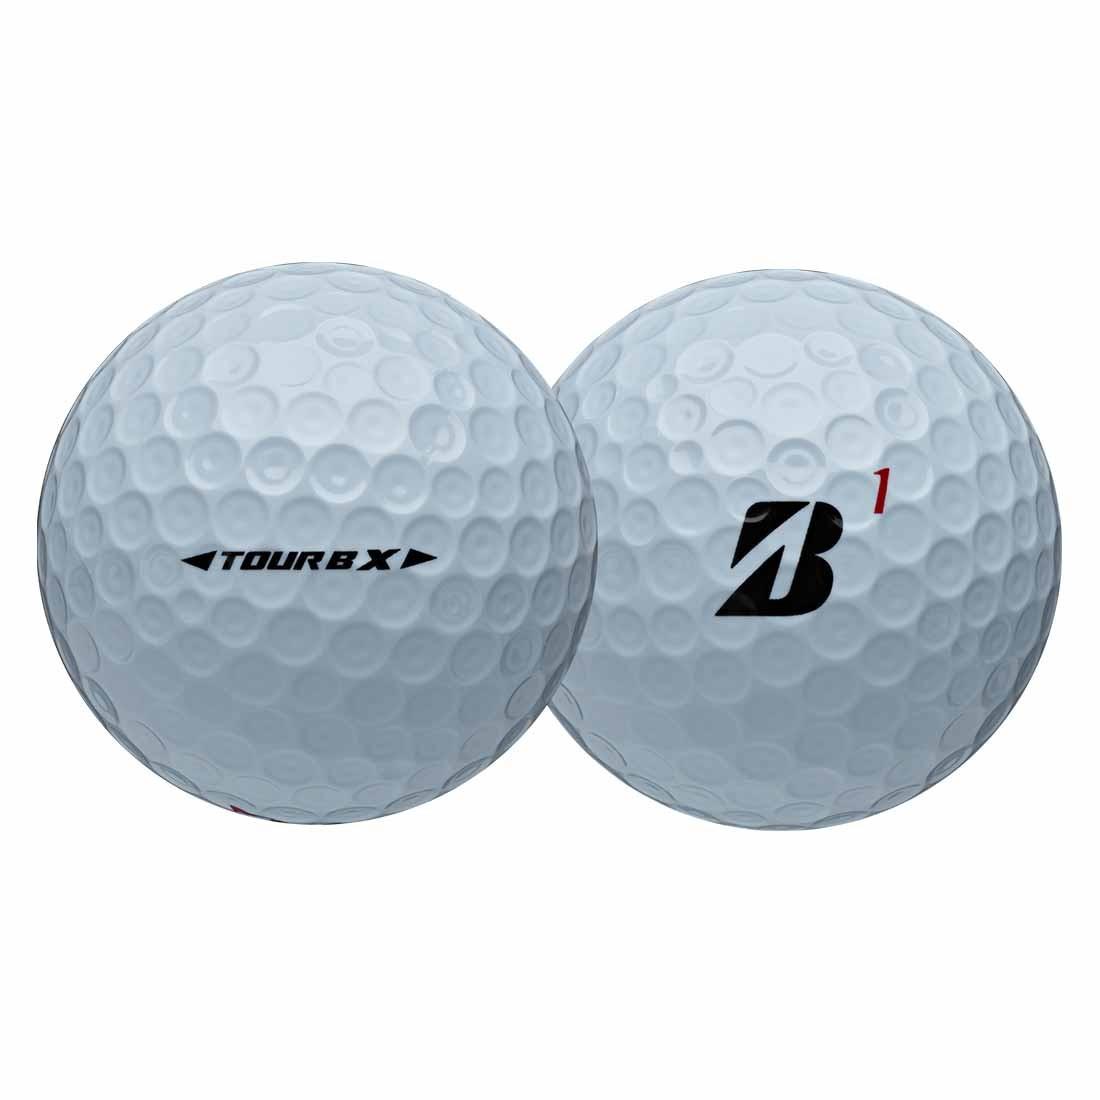 Bridgestone Tour B X Golf Ball